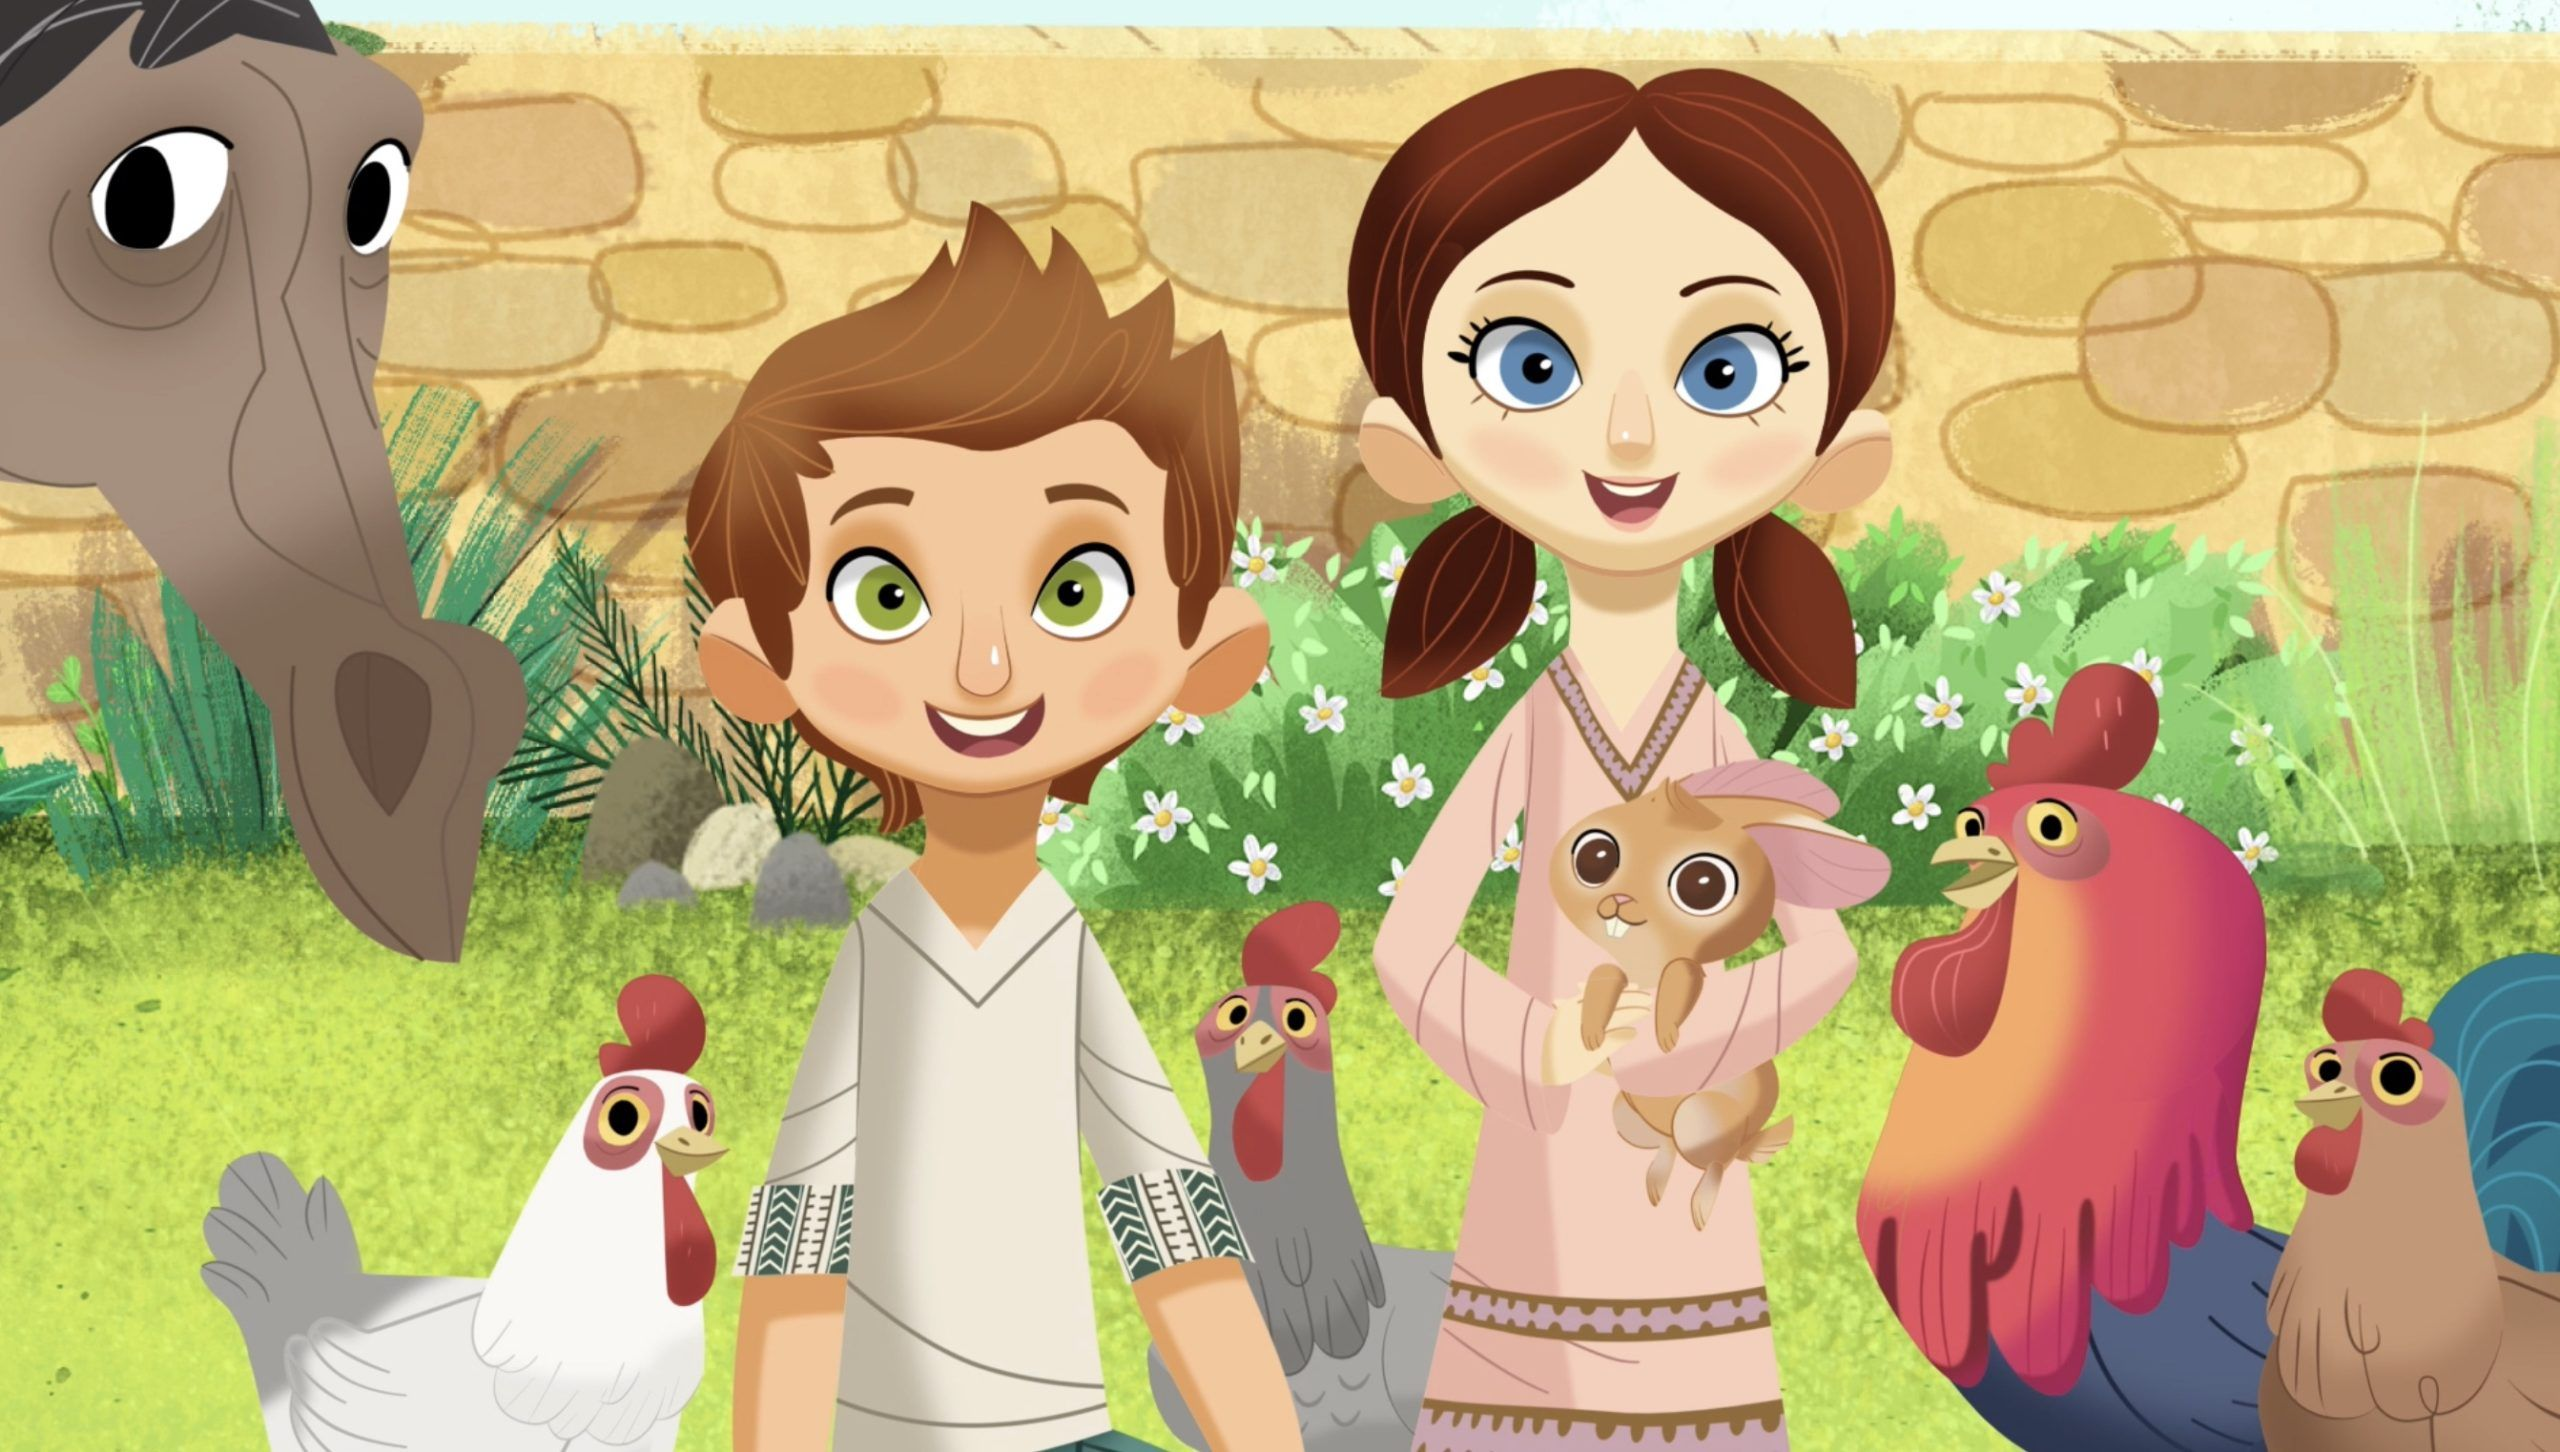 Aya and Yusuf Animated Kids Series